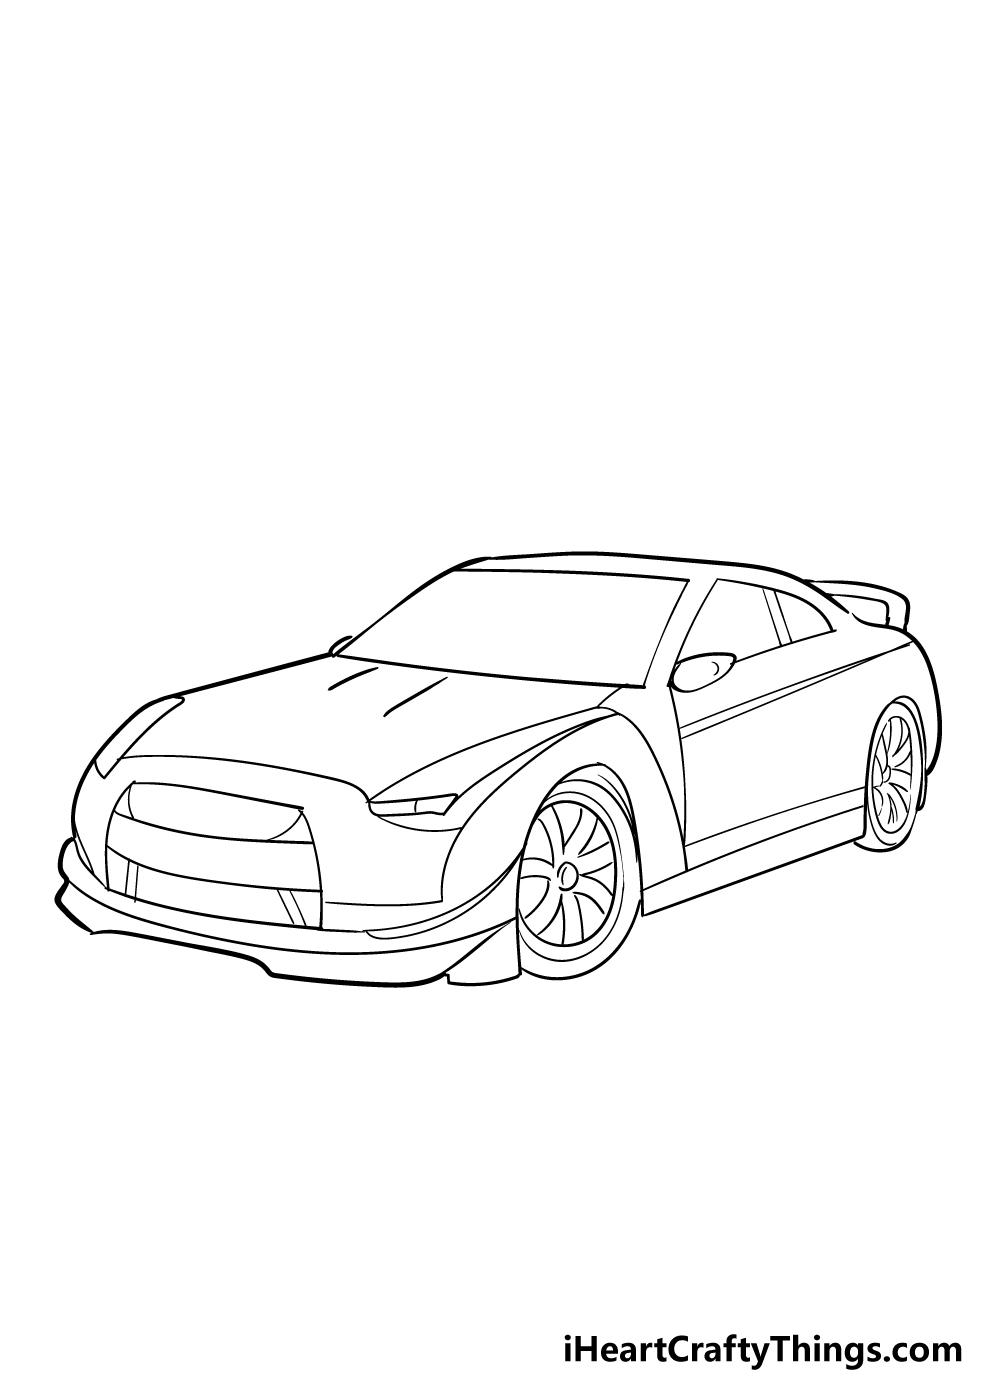 racecar drawing step 5